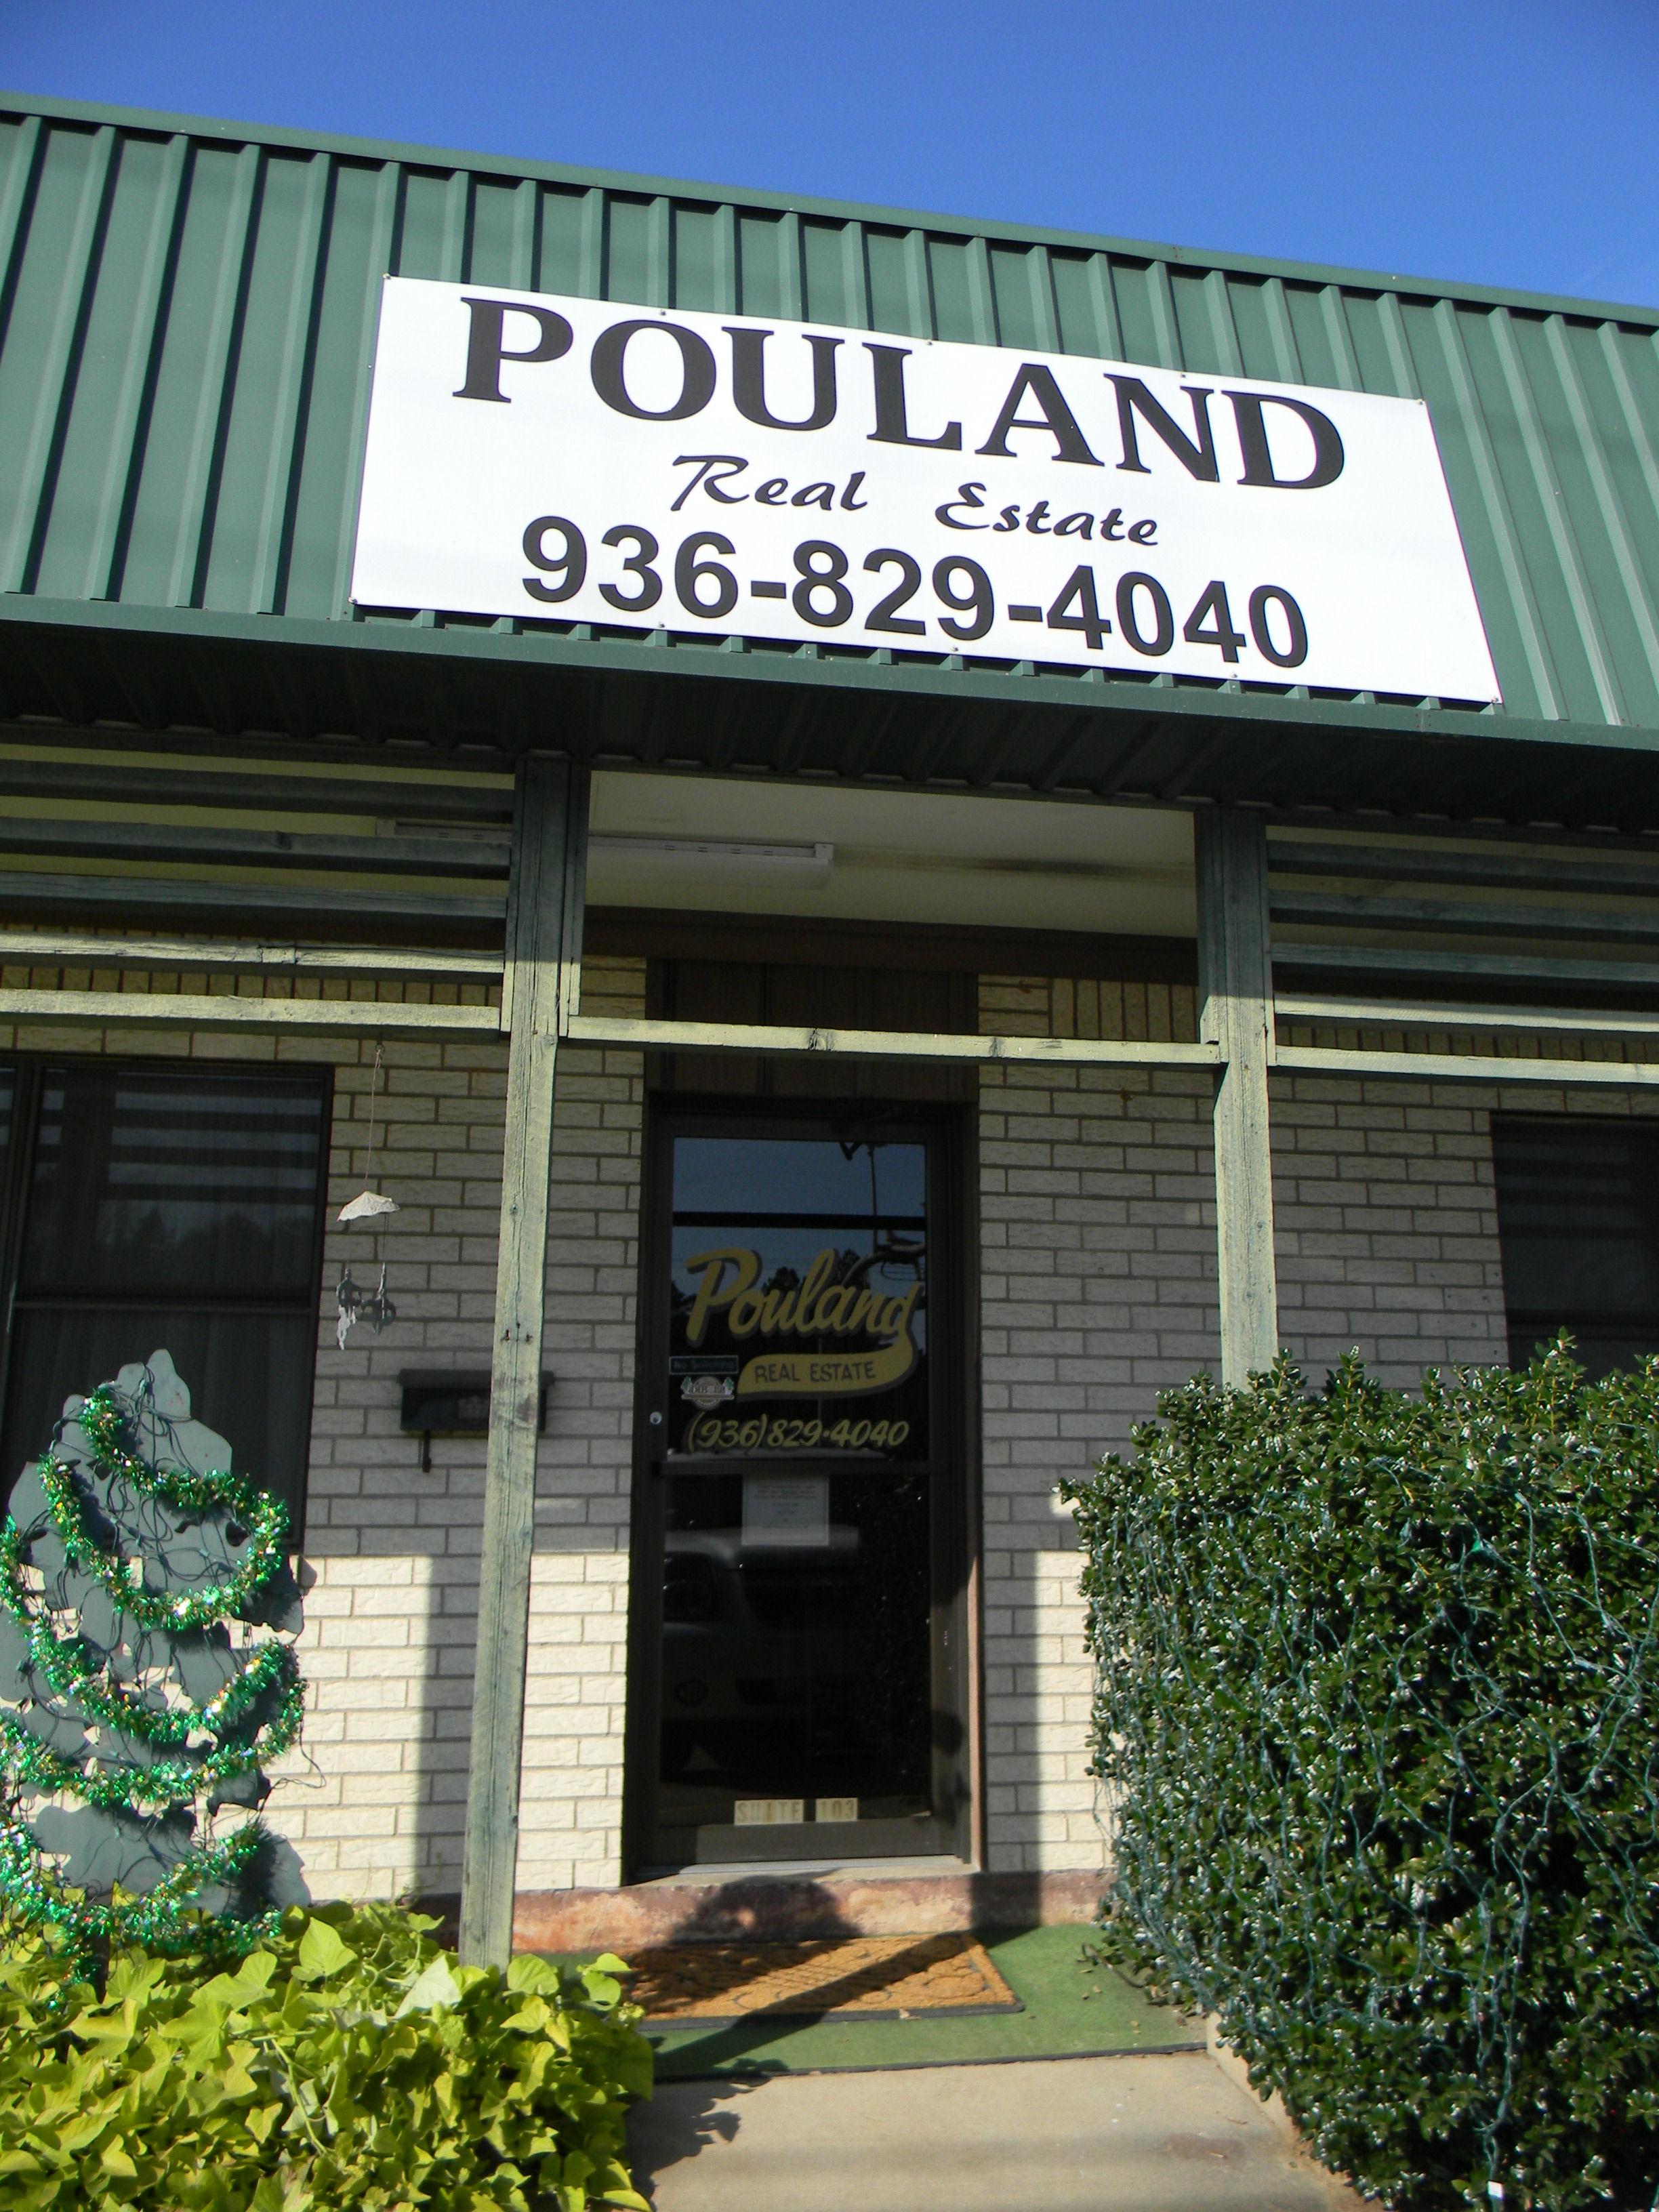 Pouland Real Estate 003